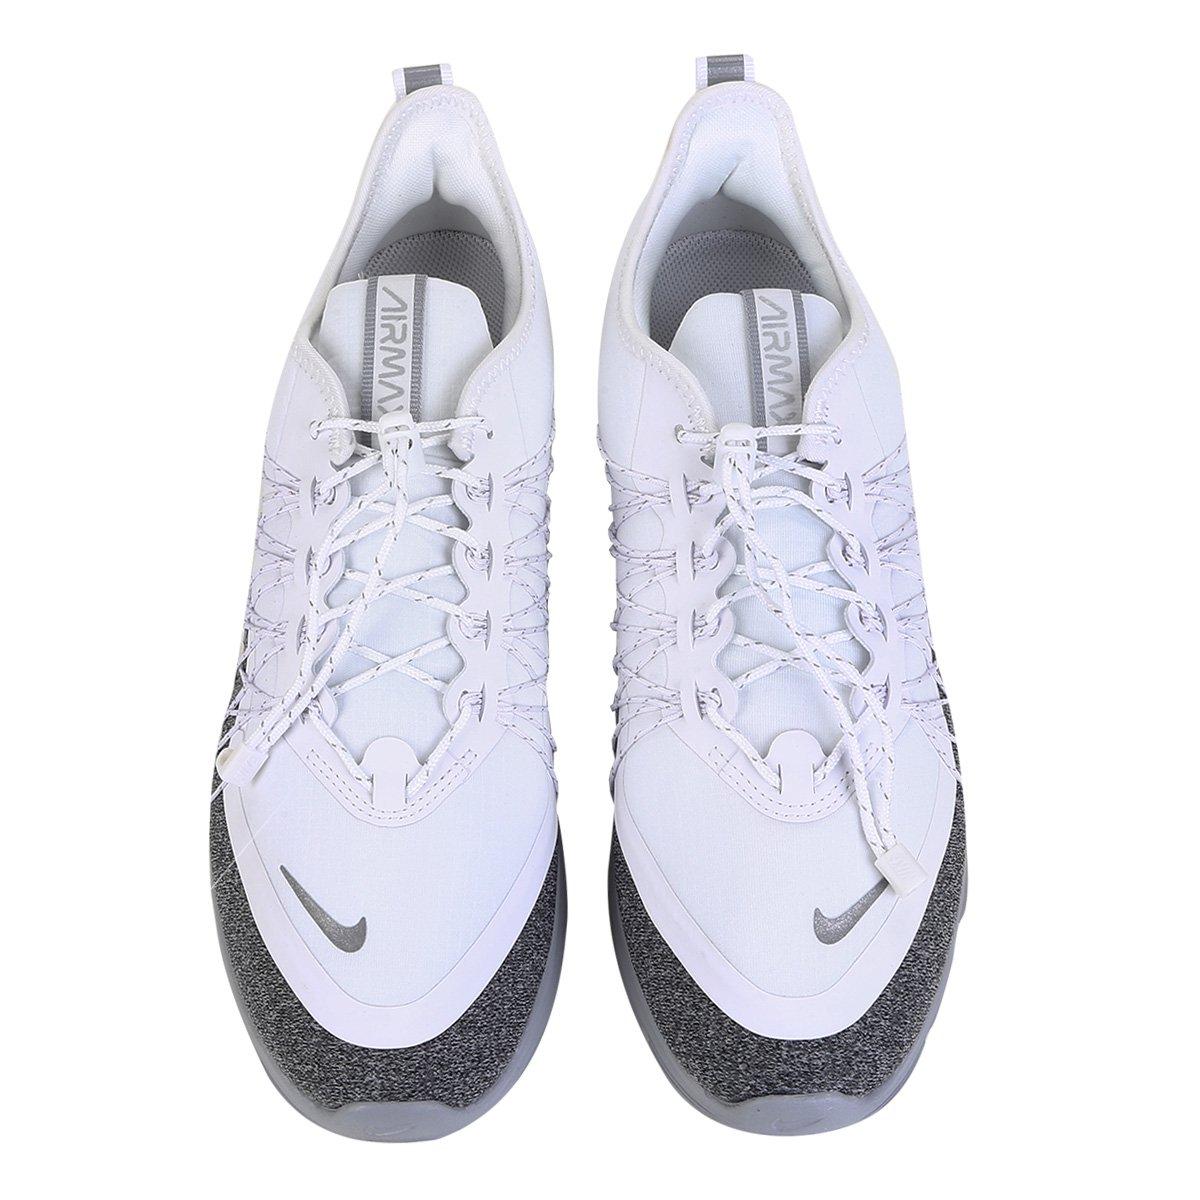 Tênis Nike Air Max Sequent 4 Utility Feminino Branco E Cinza